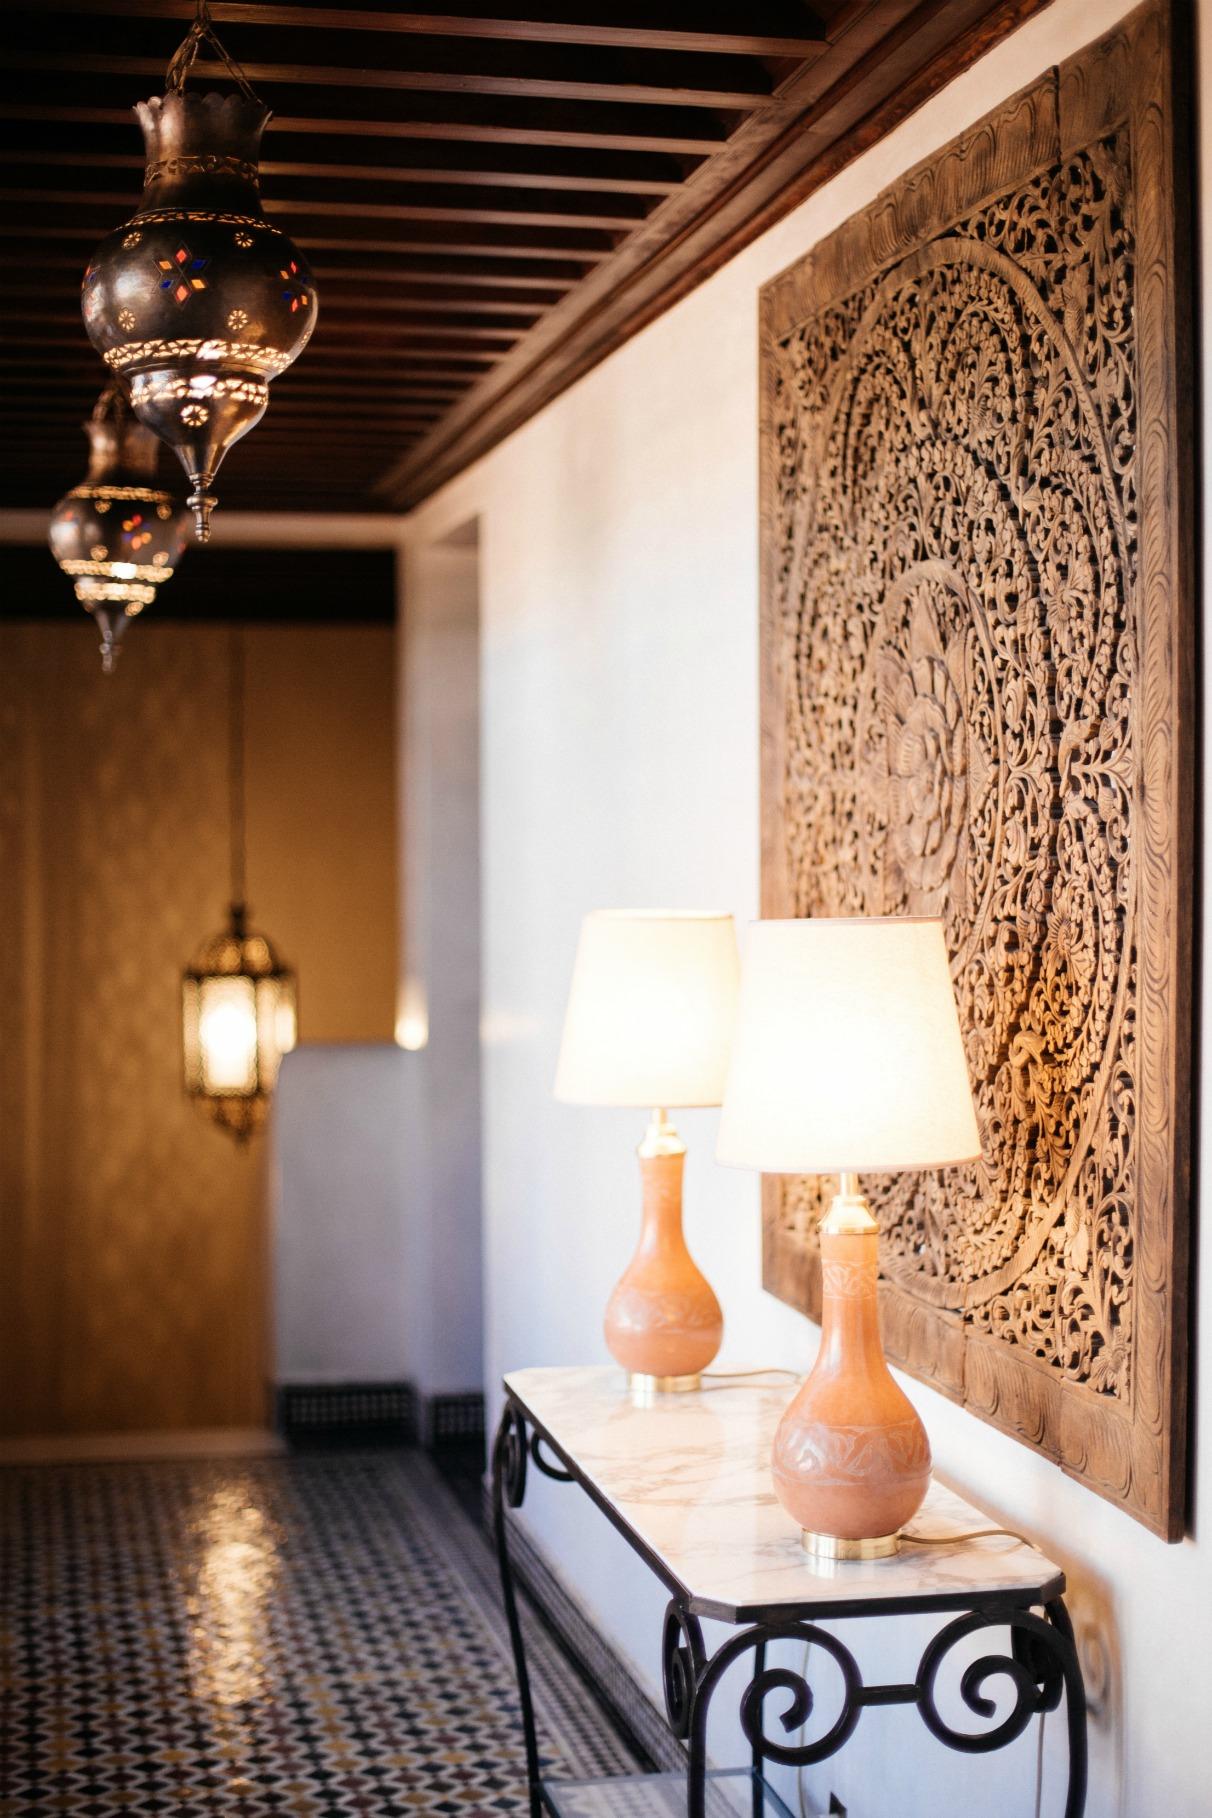 royal-mansour-hotel-luxury-marrakesch-marrakesh-morocco-edisa-shahini-disicouture-blog-18